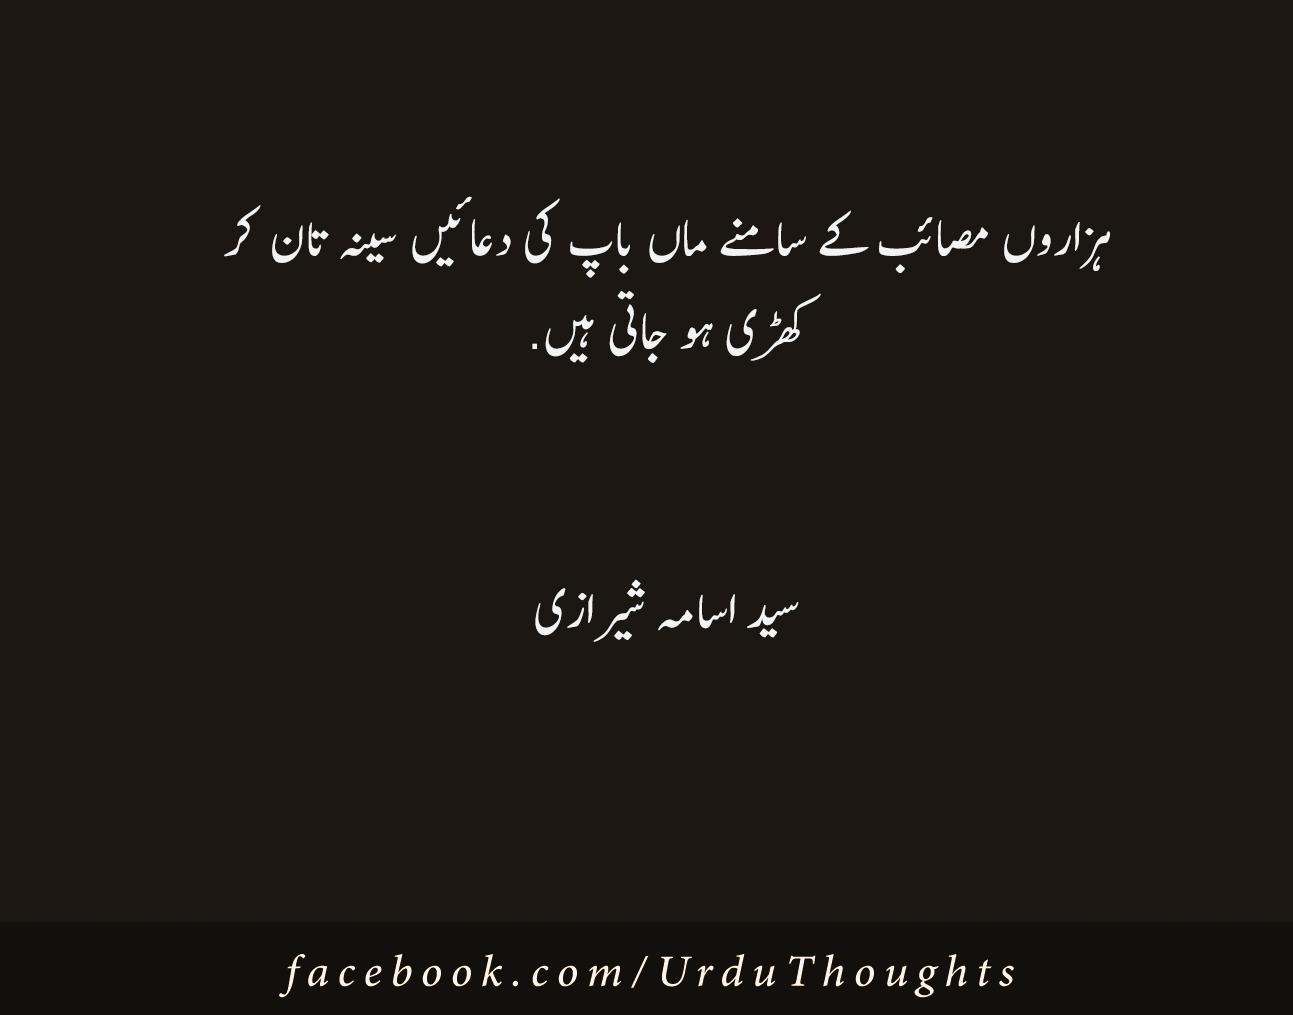 Famous Urdu Sayings Quotes Images Photos Wallpapers | Urdu ...